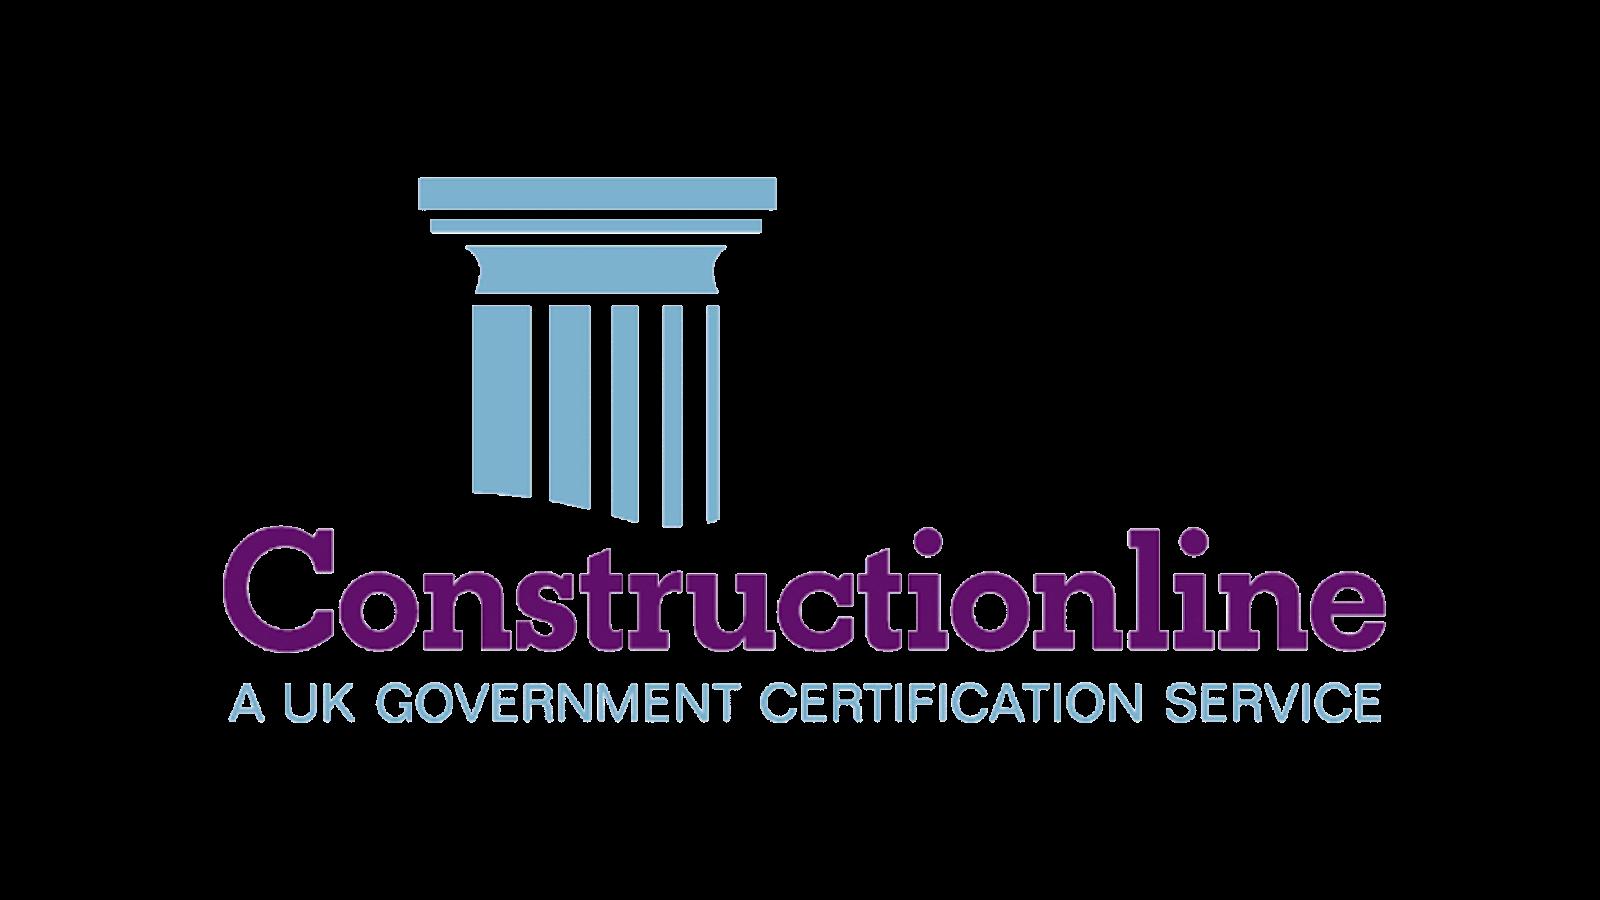 Renov8-Accreditations-Constructionline.png